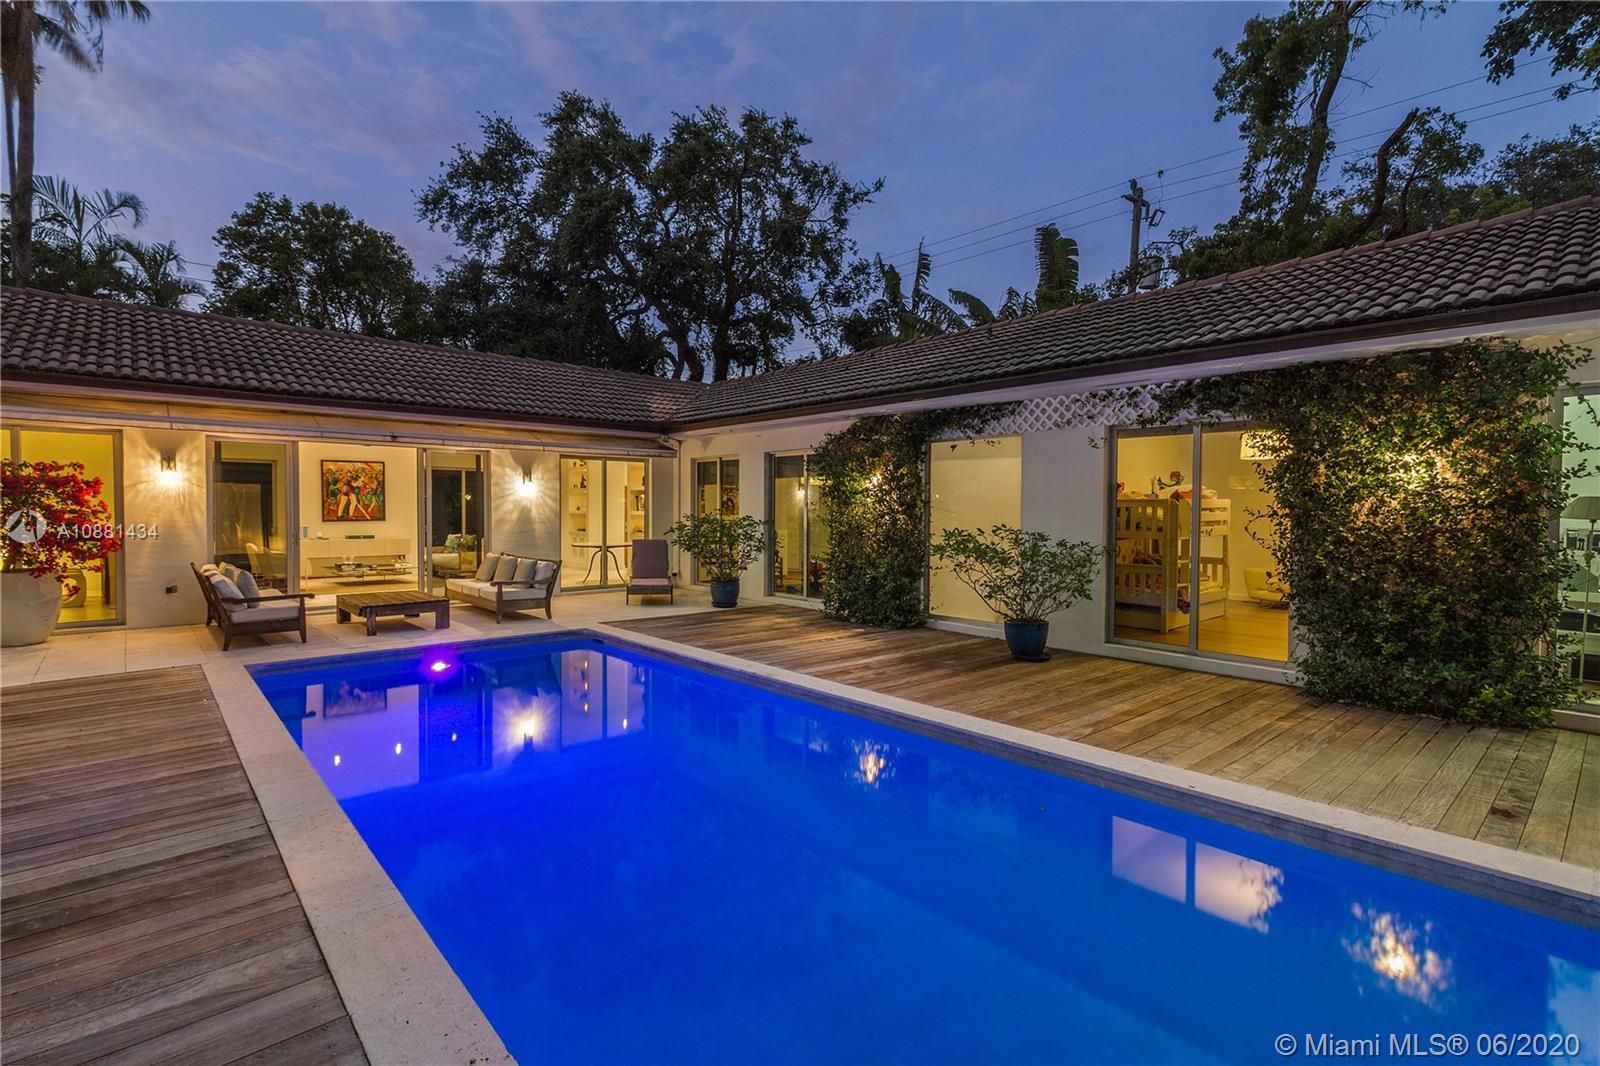 3200 Ah We Wa St, Miami, Florida 33133, 5 Bedrooms Bedrooms, ,6 BathroomsBathrooms,Residential,For Sale,3200 Ah We Wa St,A10881434